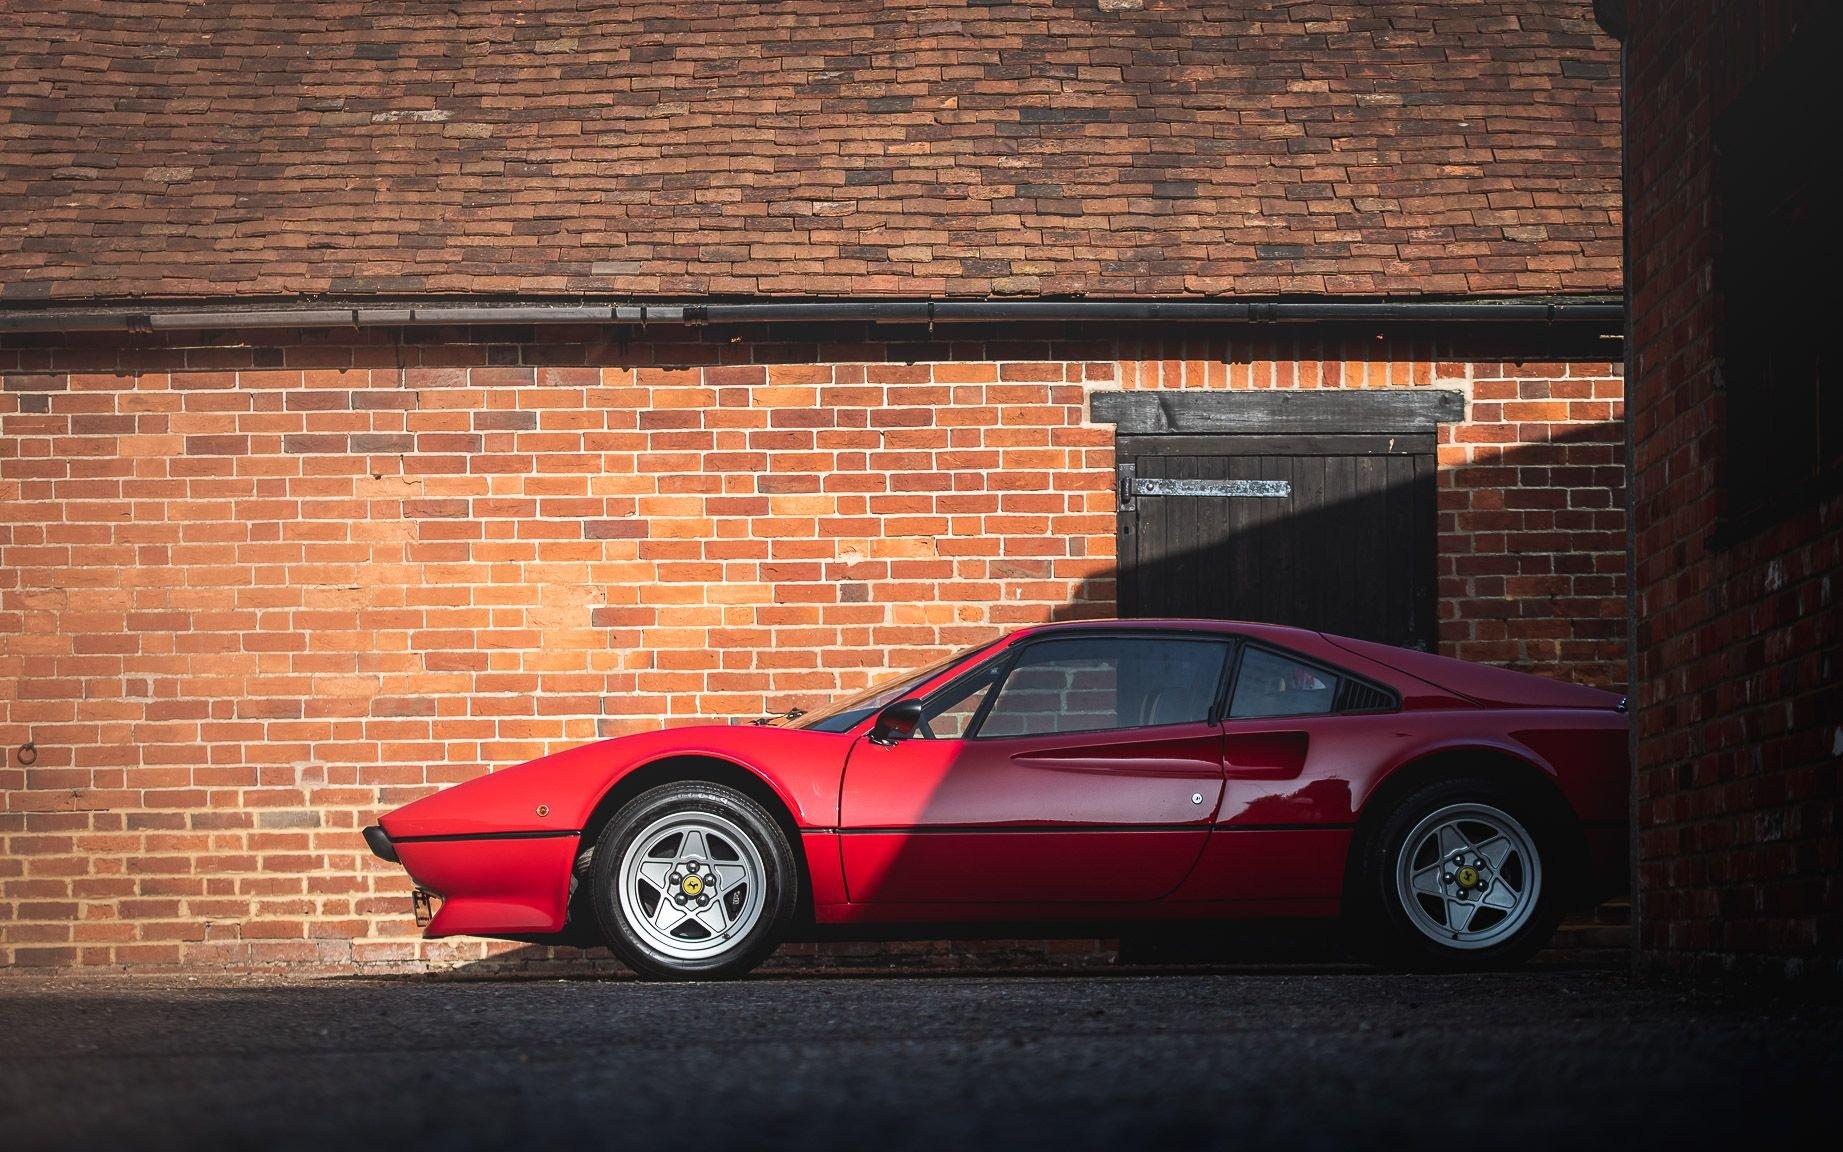 1978 Ferrari 308GTB 1979 3.0 Dry Sump For Sale (picture 9 of 18)